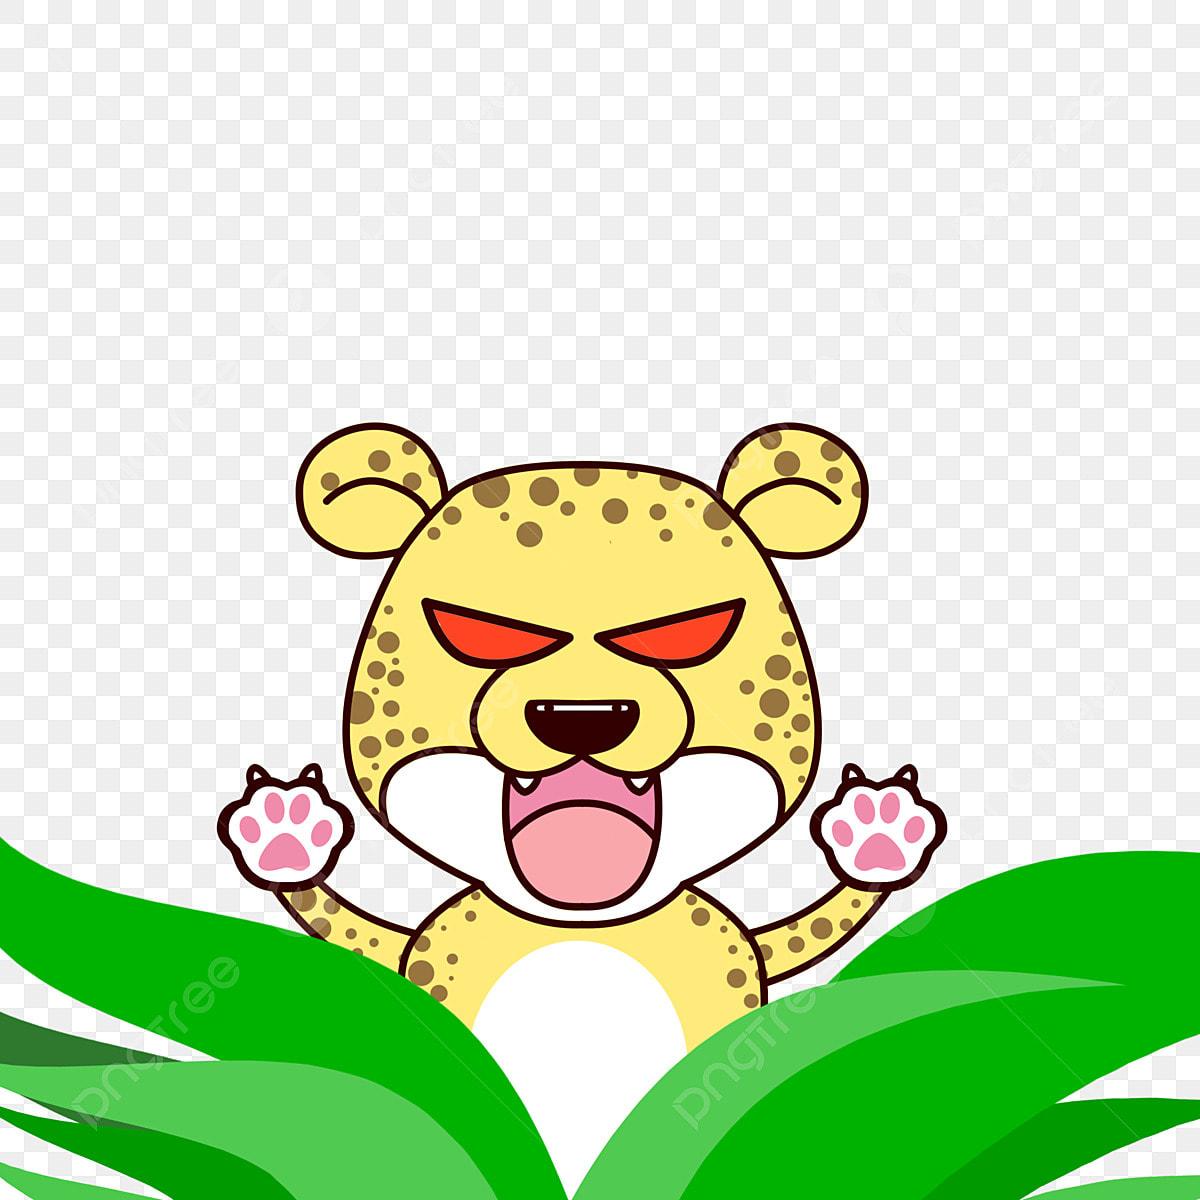 Animated Cheetah Wallpaper cartoon cartoon animals cartoon little cheetah cartoon